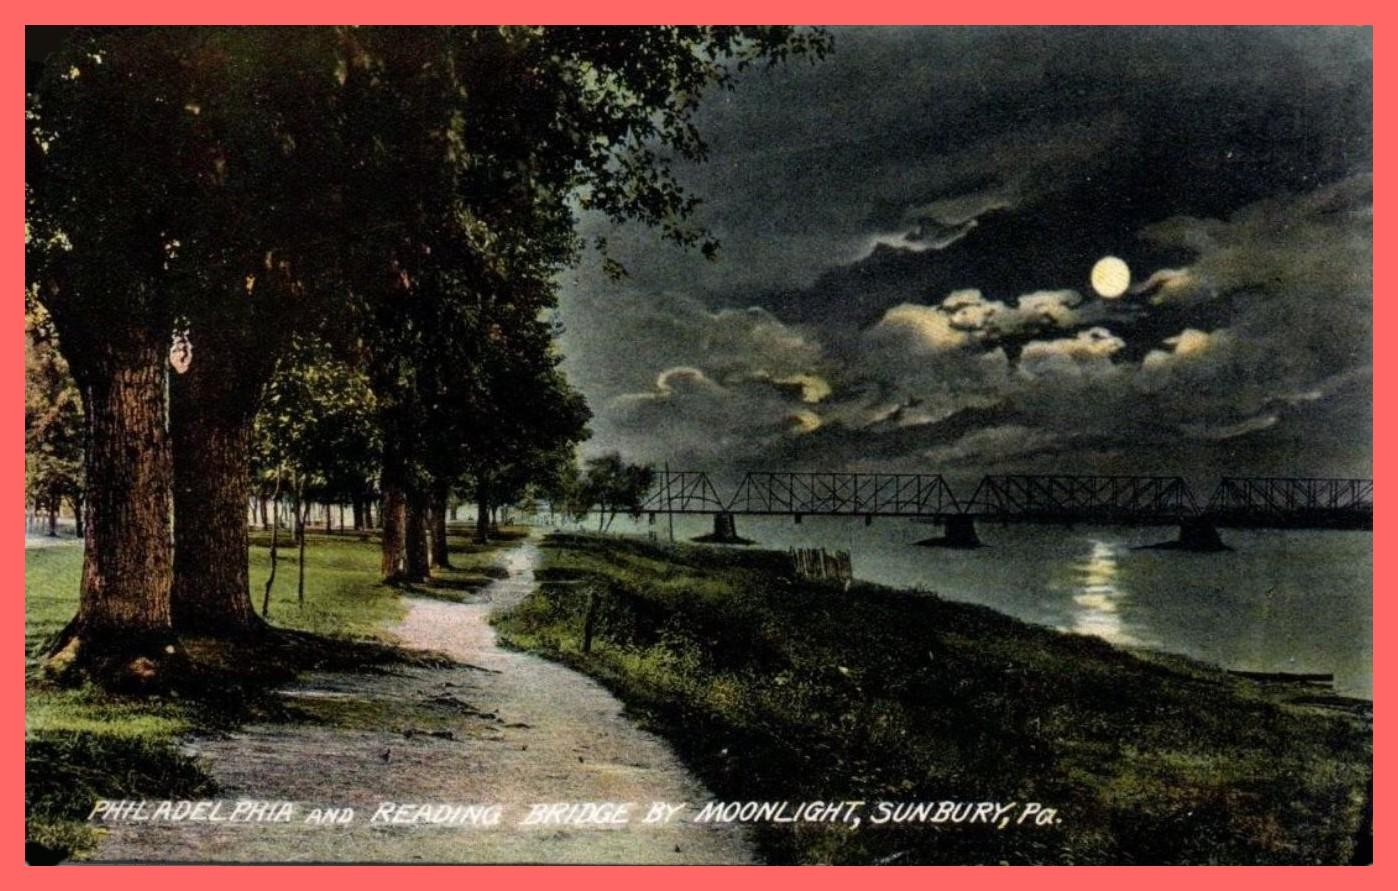 sunbury-philareadingrrbridge-moonlight-001a